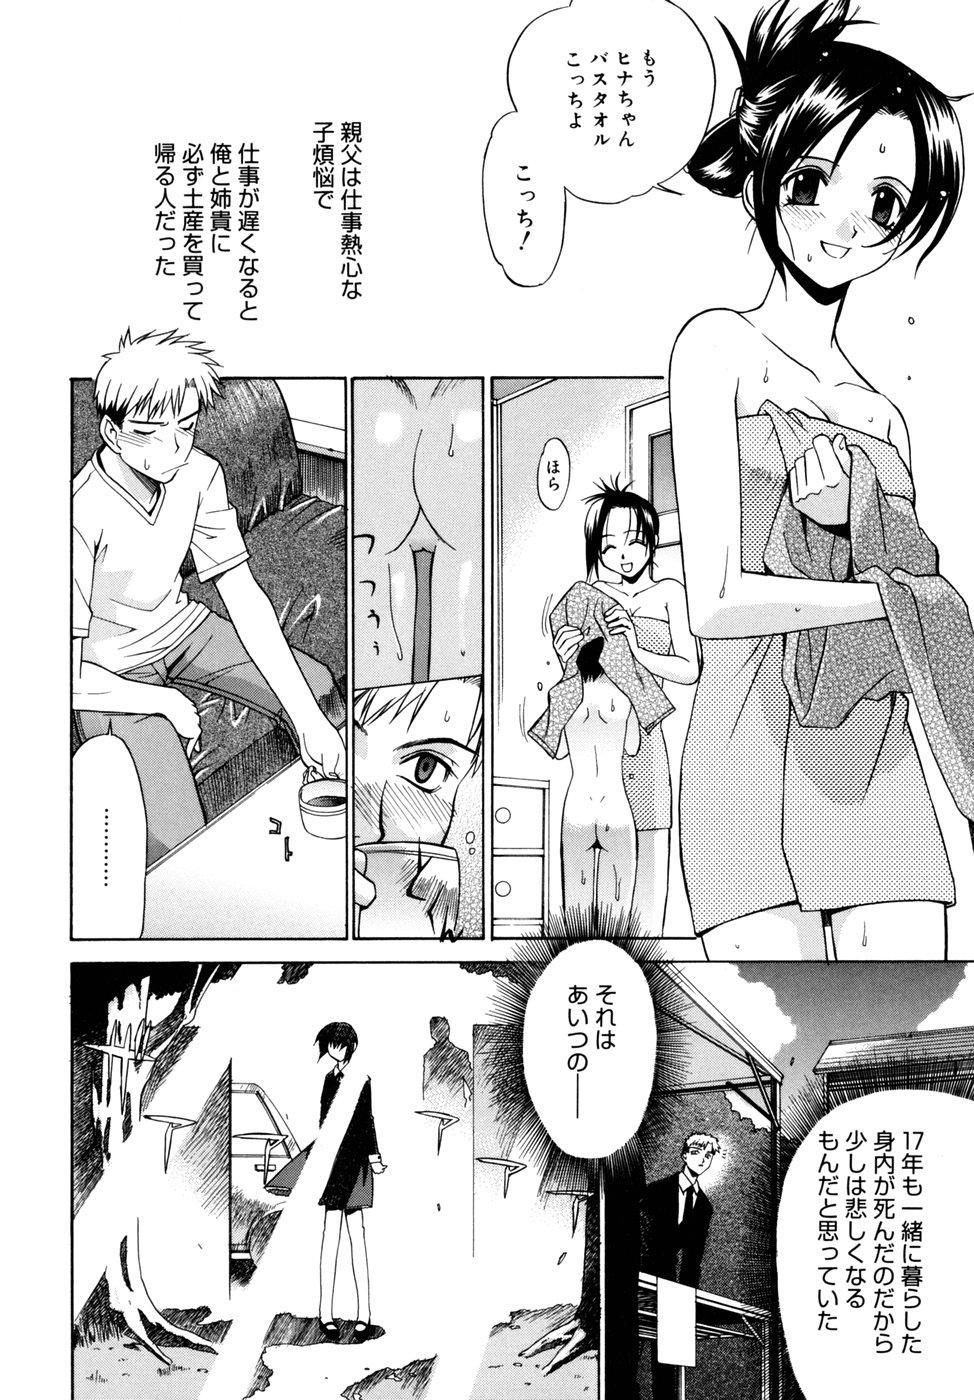 [Yaya Hinata] Tonari no Miko-san wa Minna Warau - The next shrine maidens smile in everyone. 199